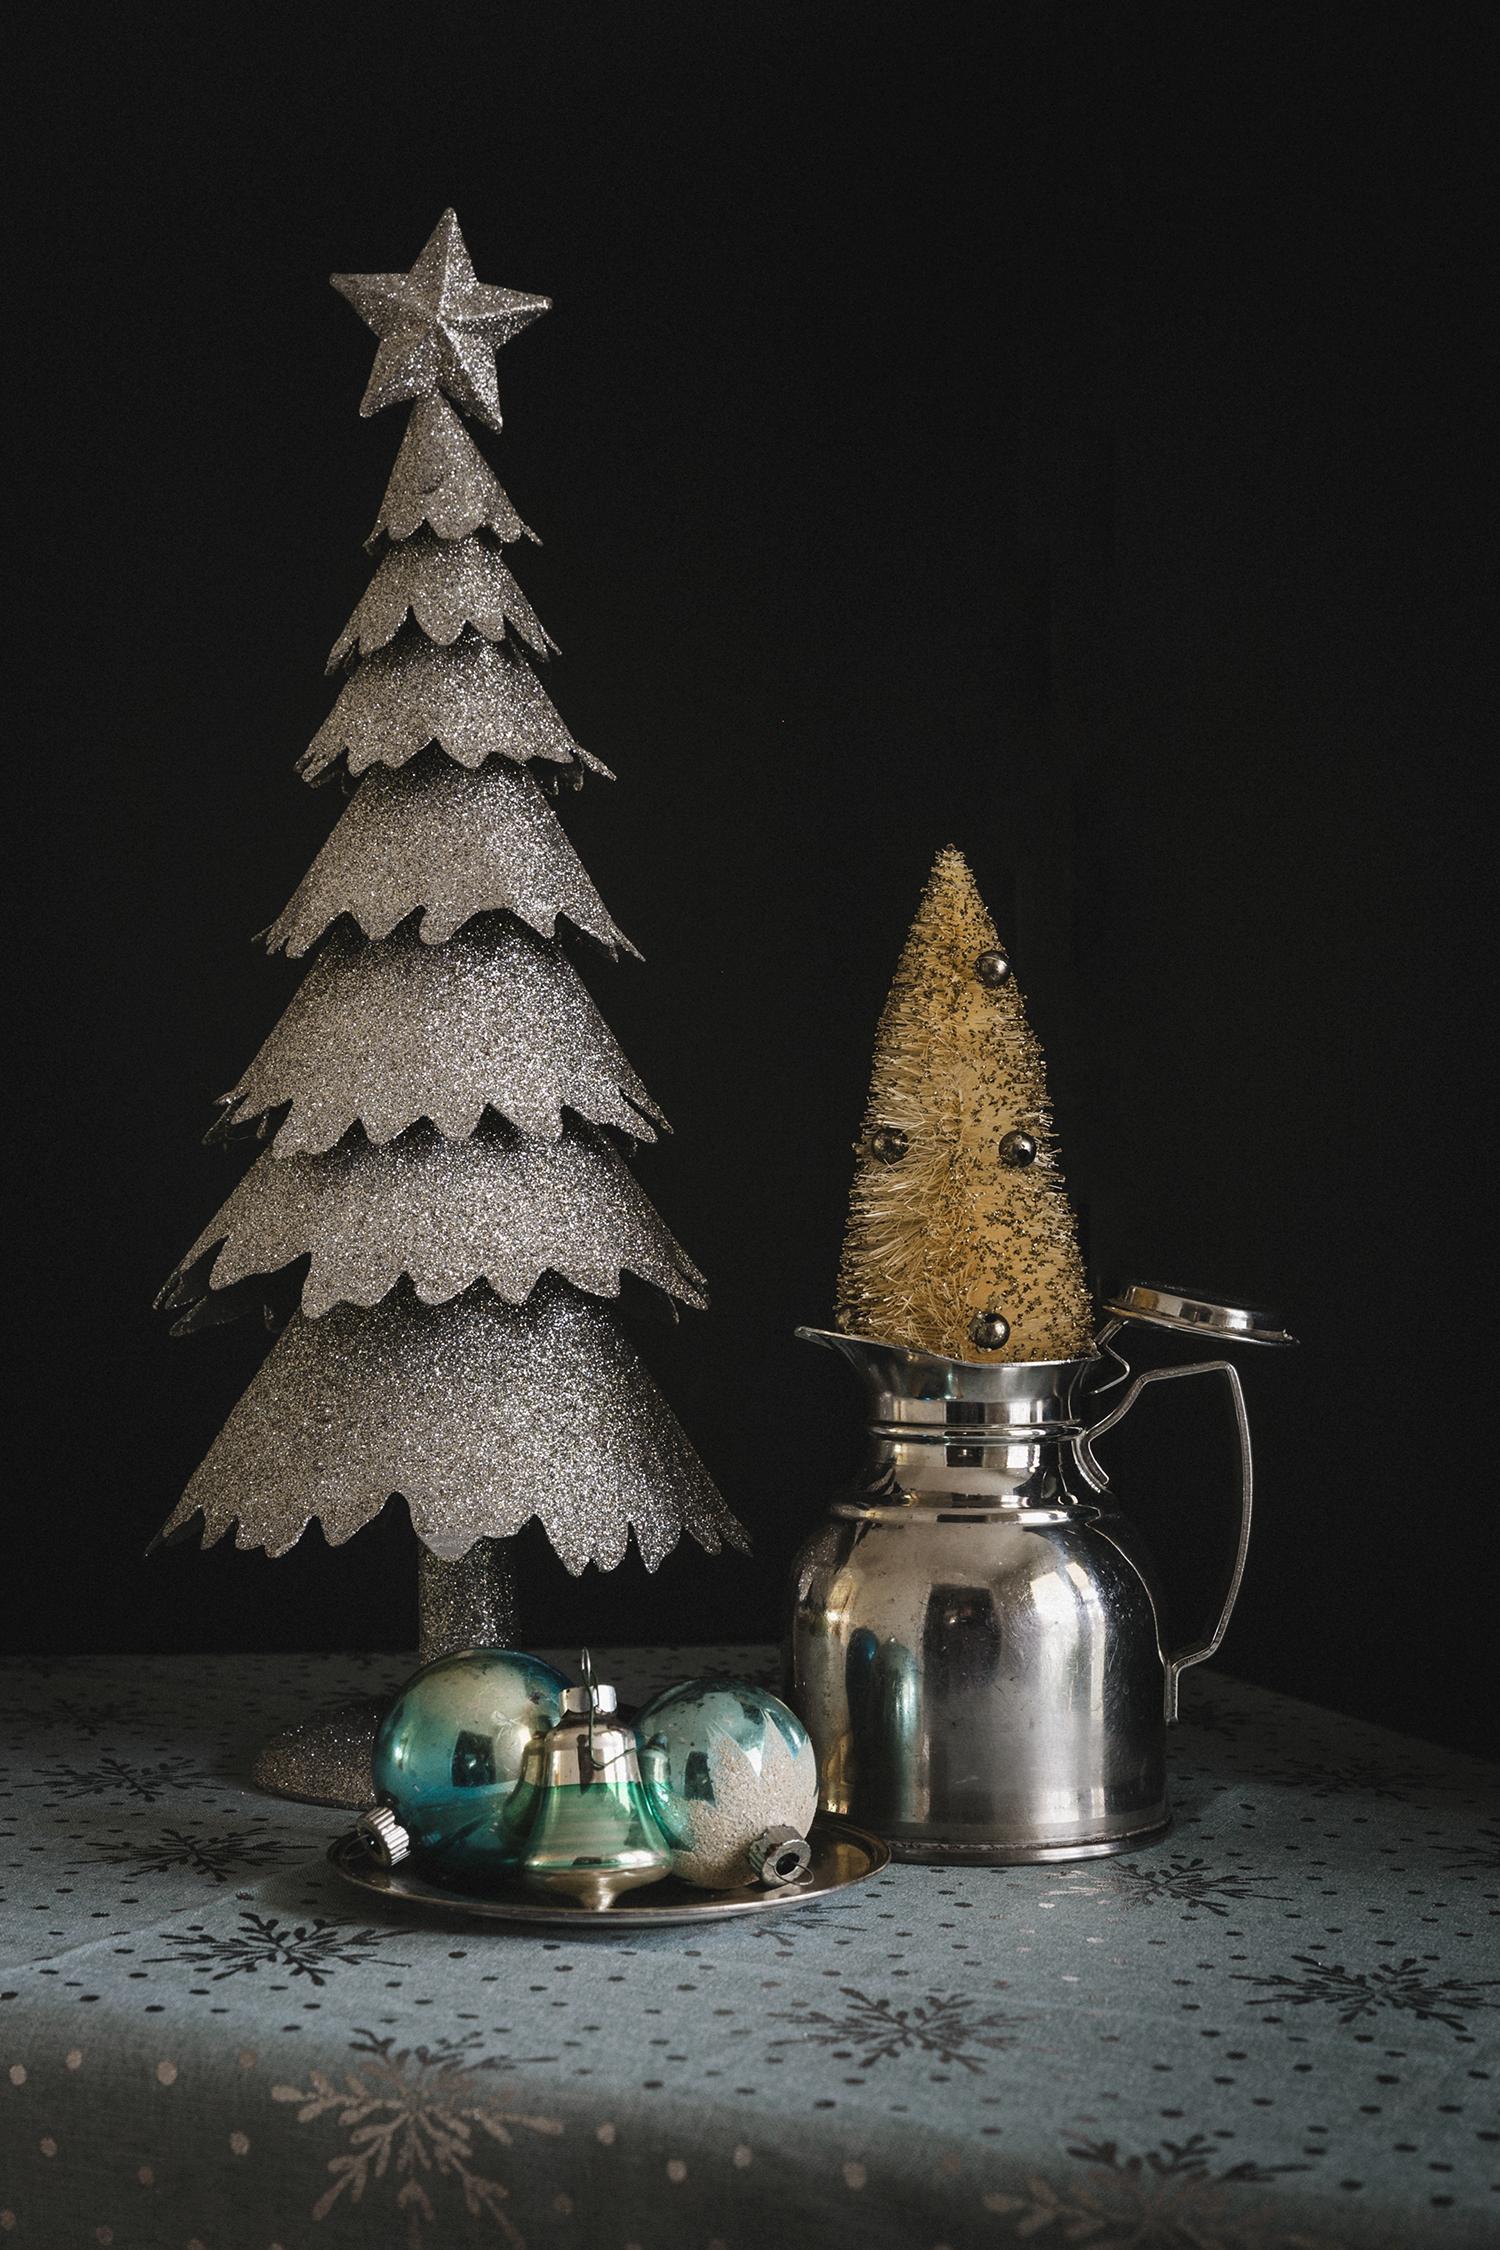 Christmas_DutchMasters_0032.jpg